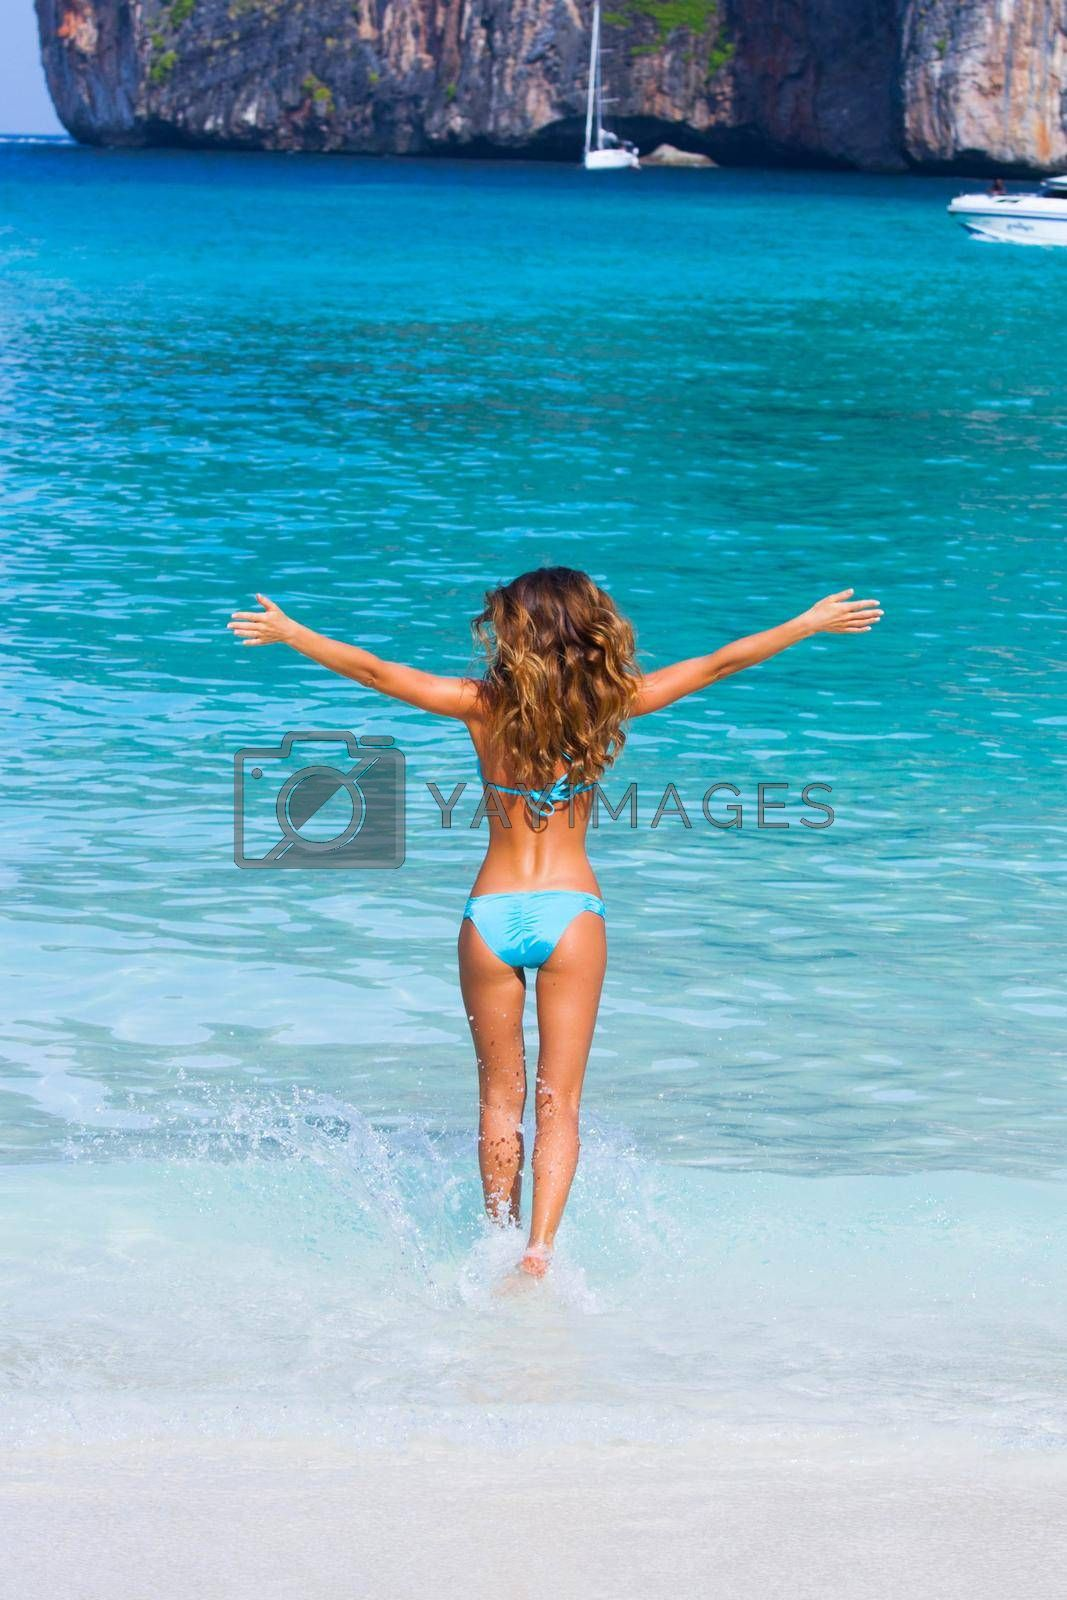 Royalty free image of Woman enjoying summer vacation by Yellowj